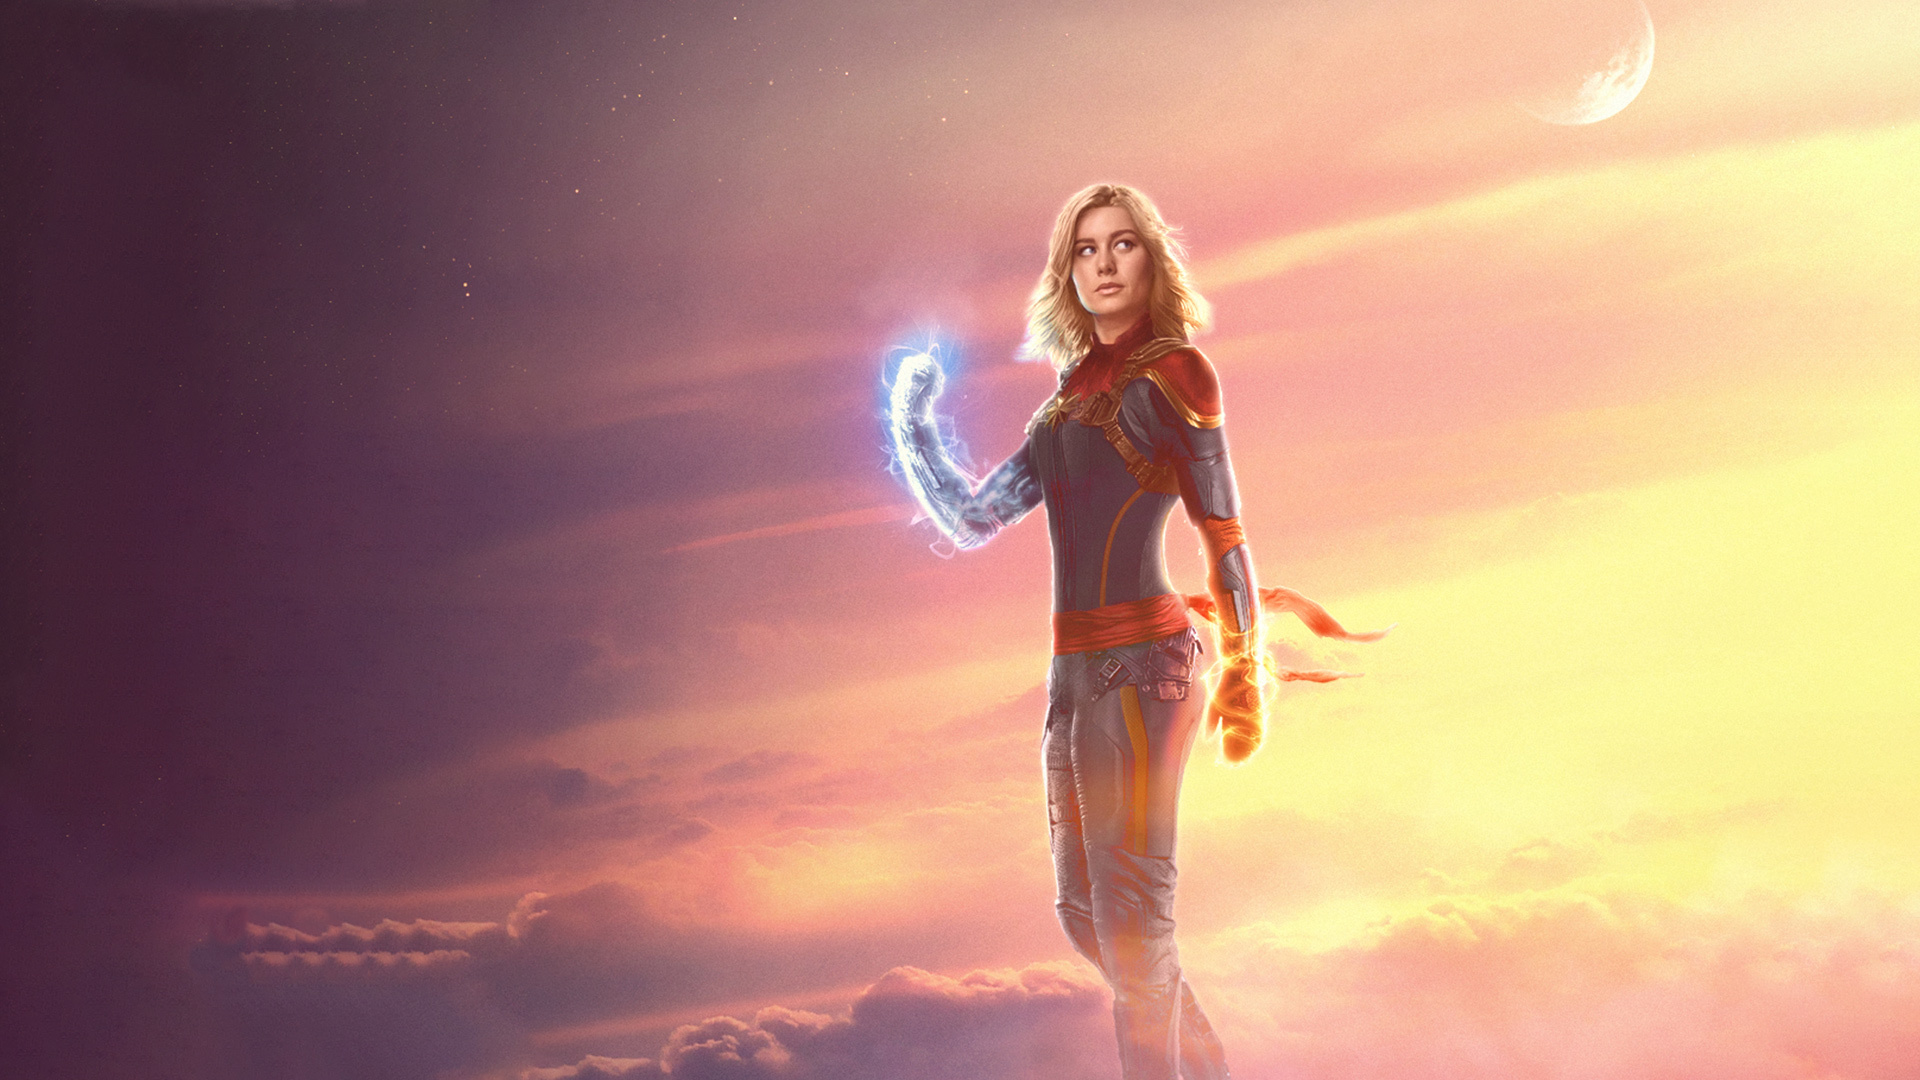 Hình Captain Marvel đẹp nhất